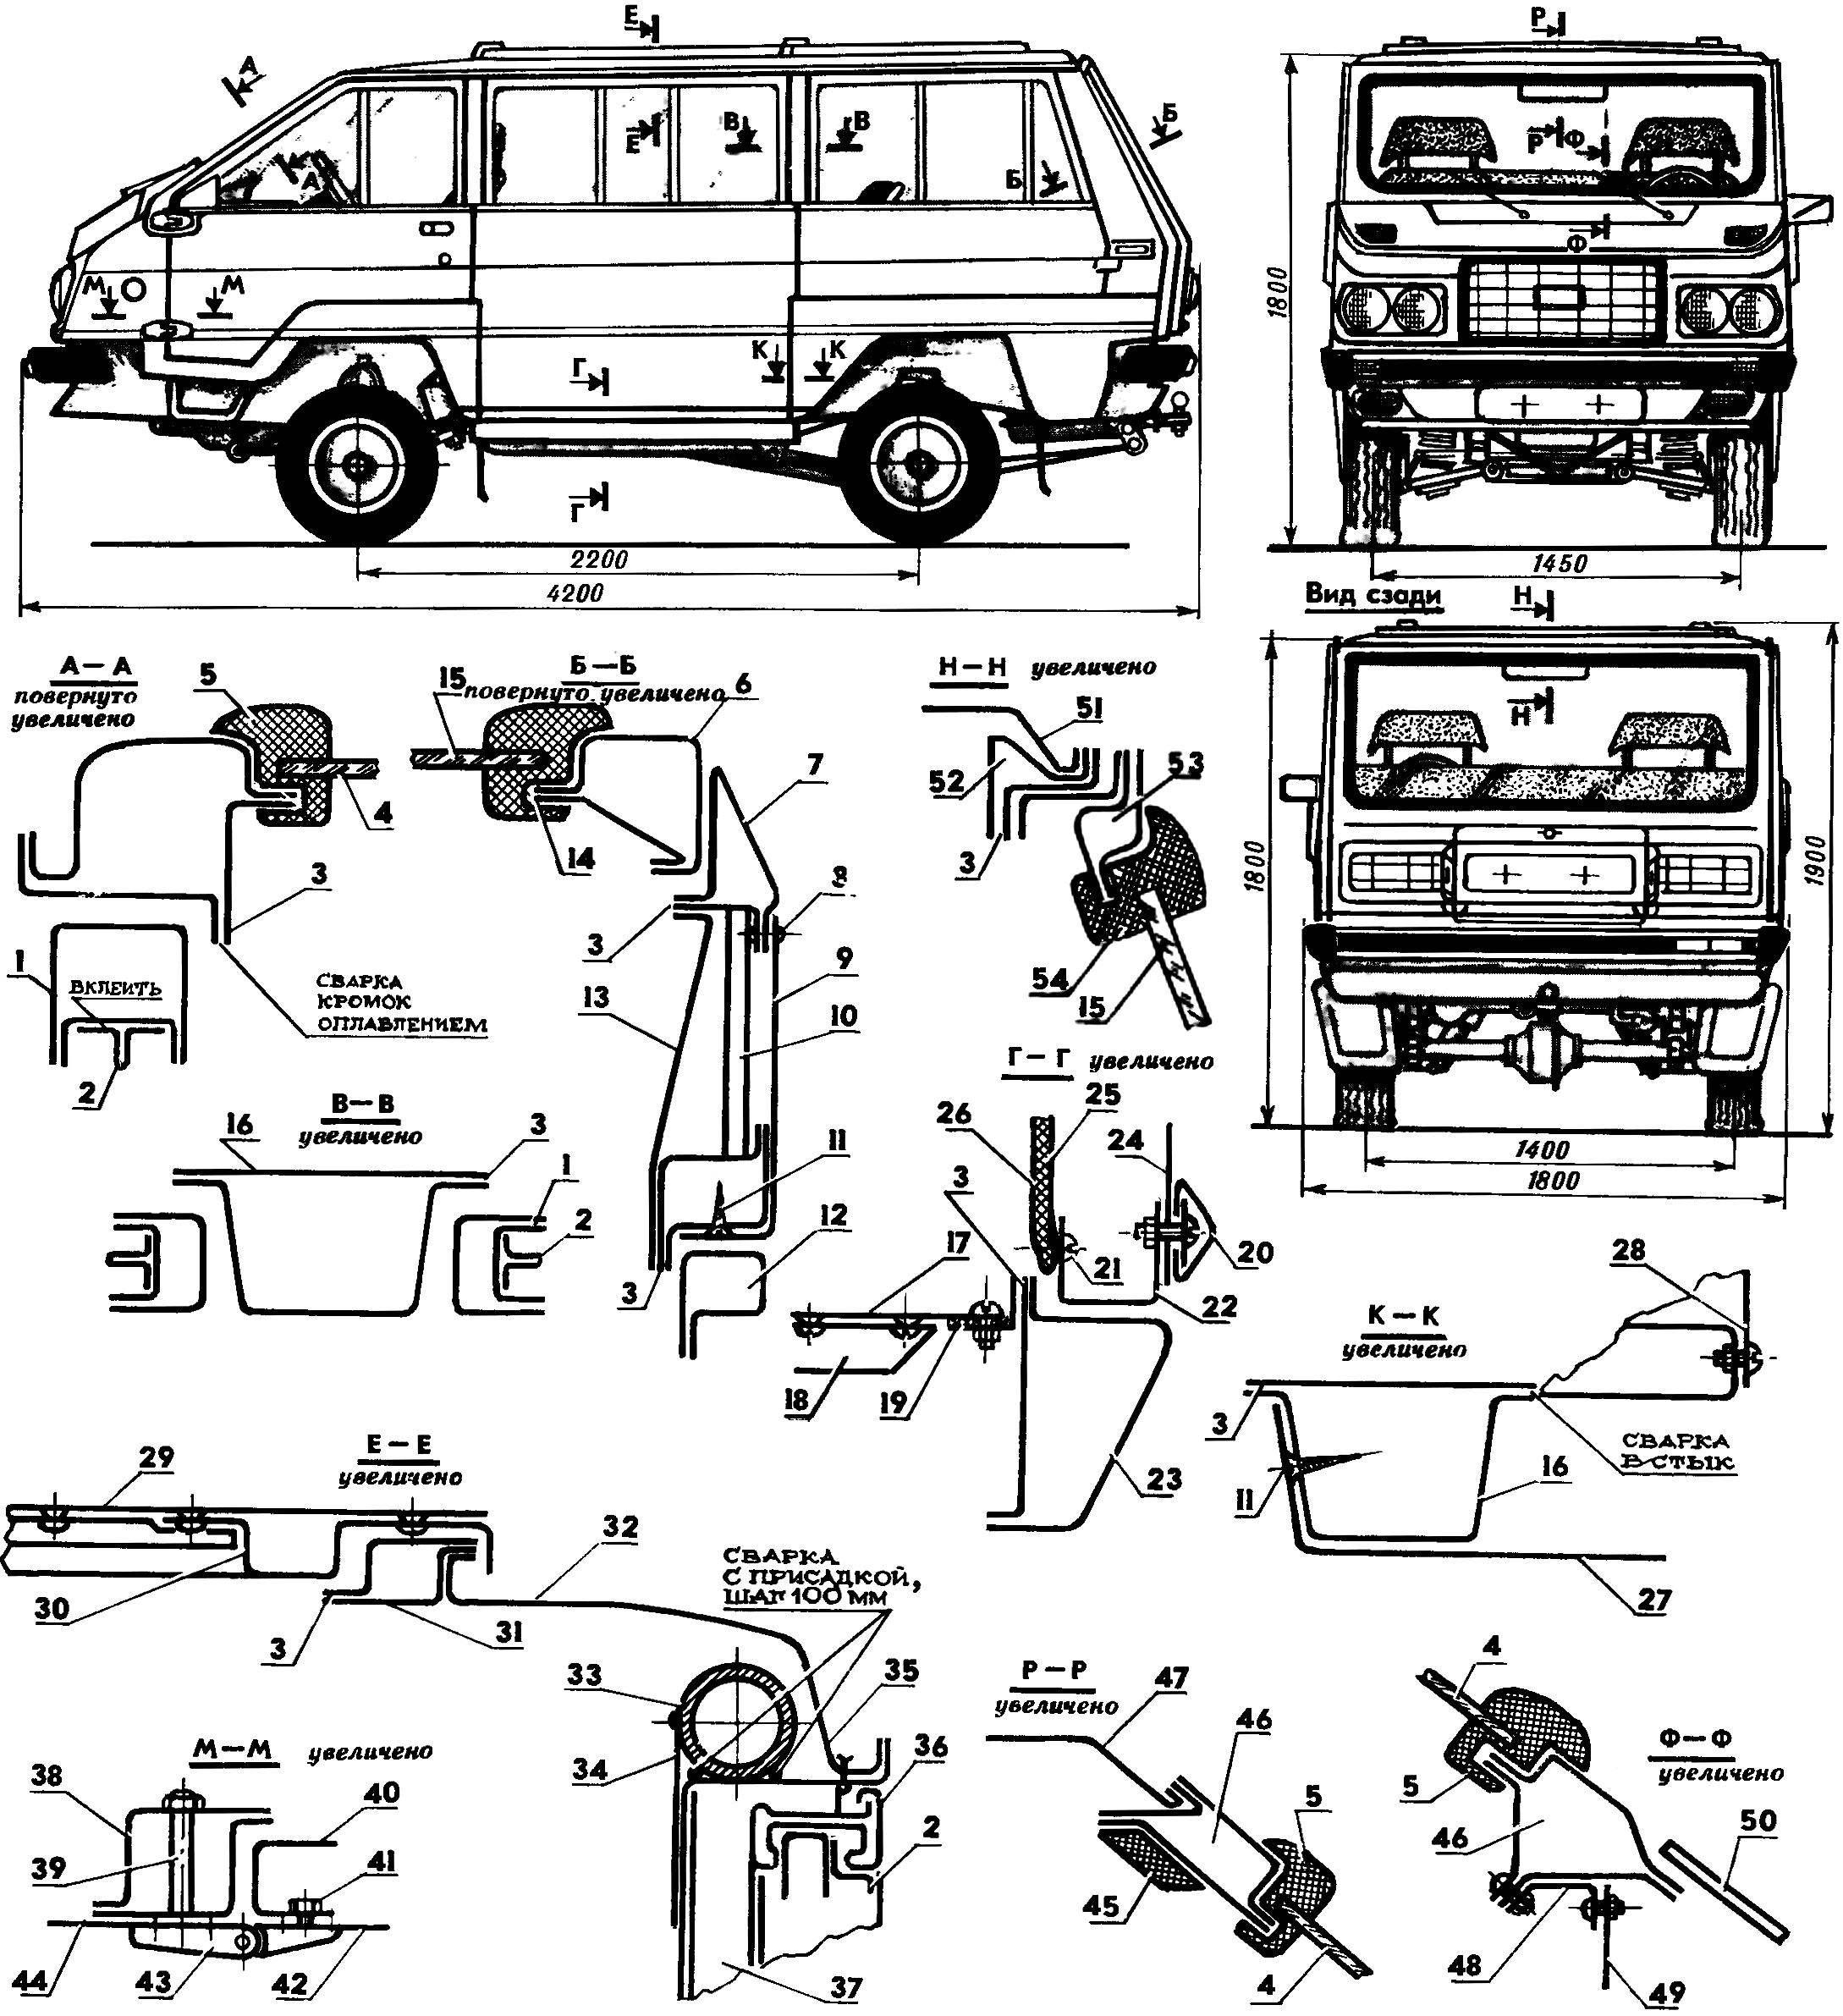 Рис. 1. Общий вид автомобиля САБС-2